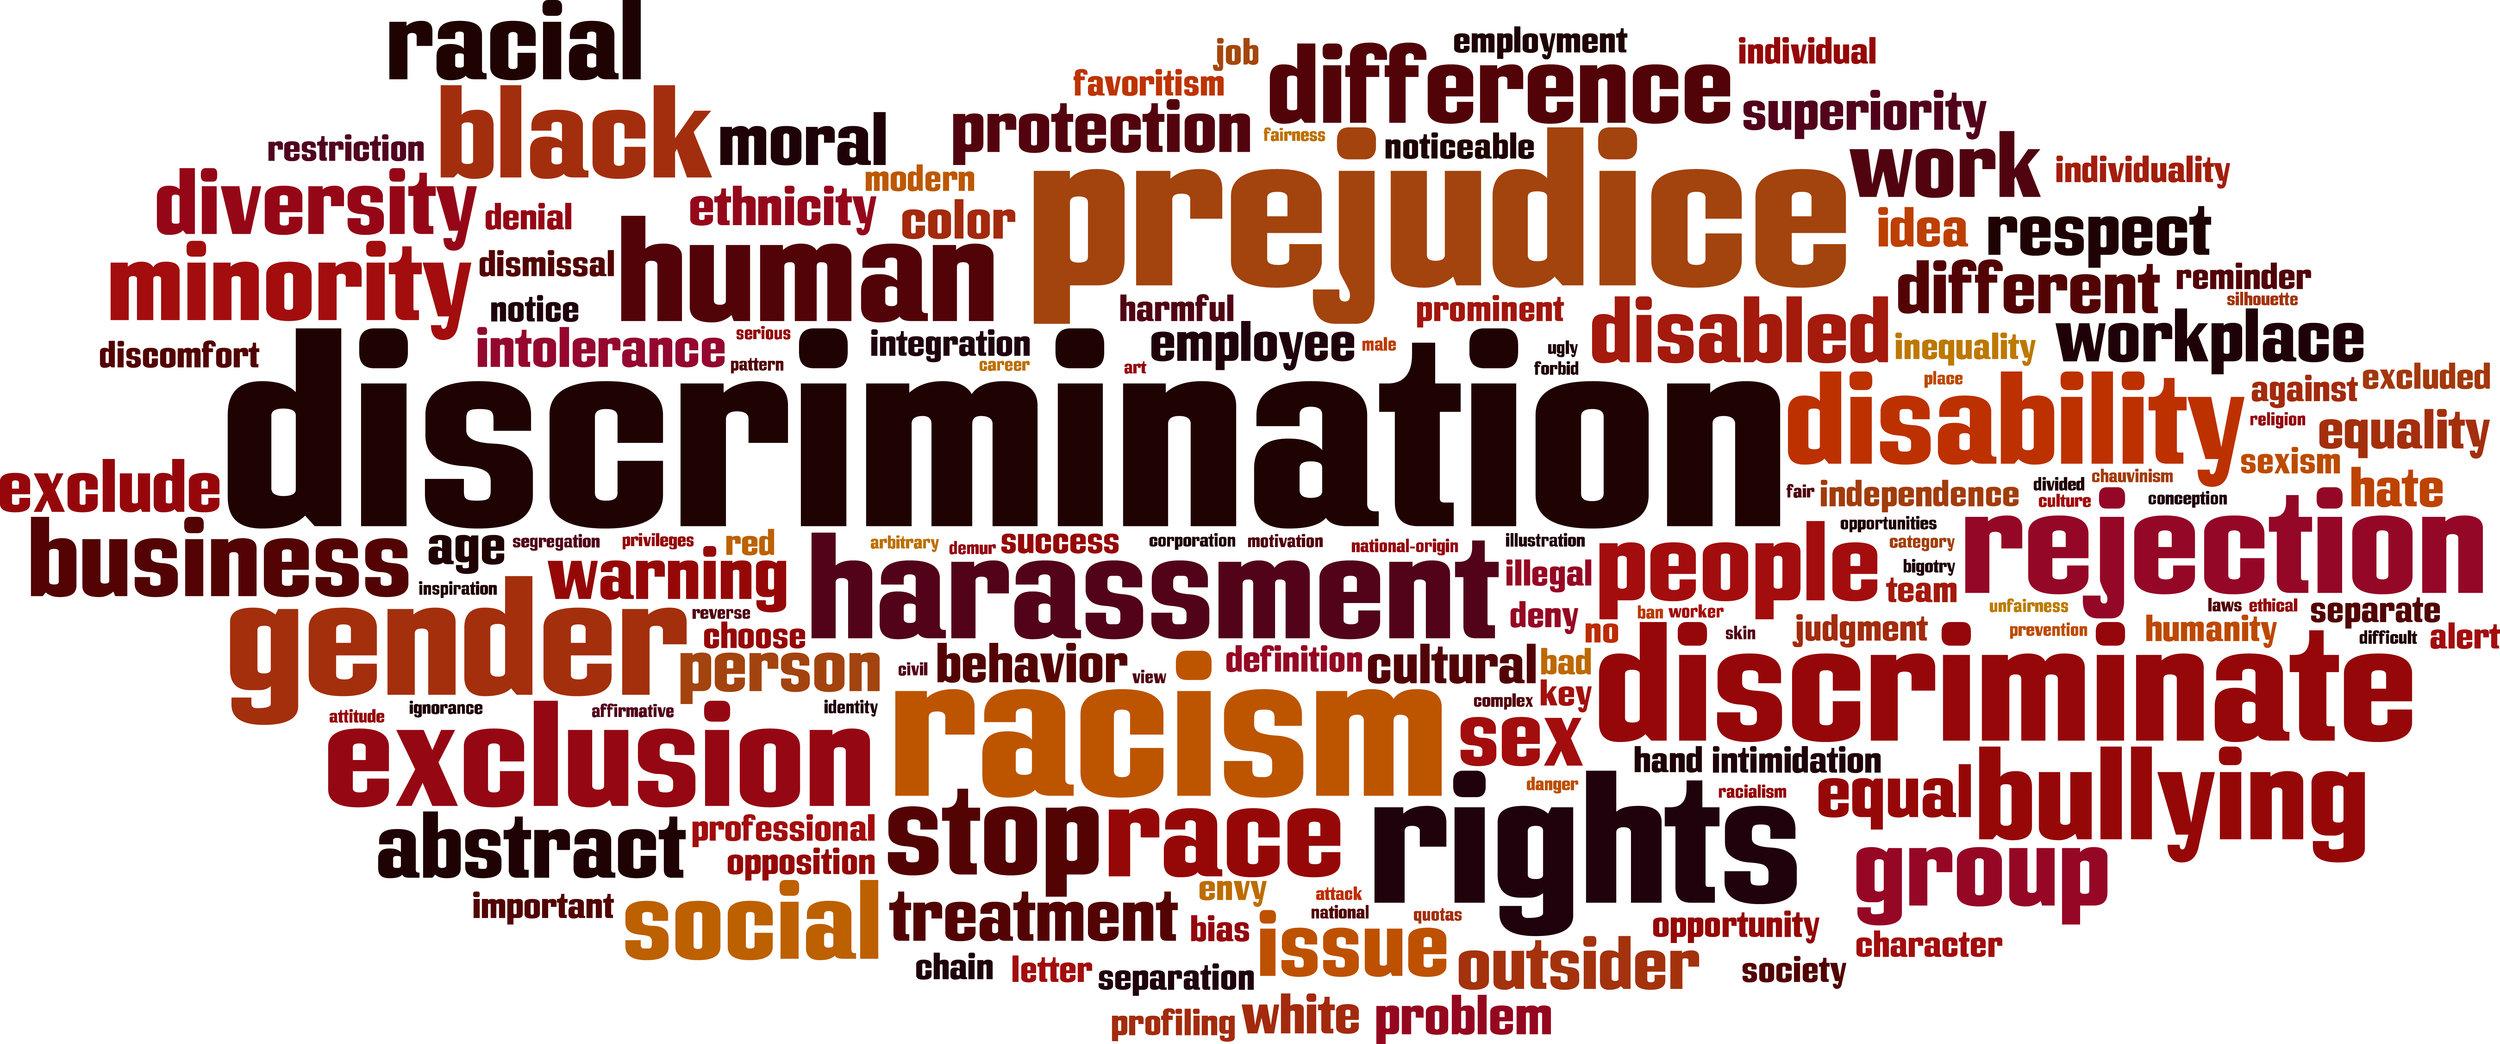 Photo Credit:  http://www.california-labor-law-attorney.com/californias-discrimination-laws/